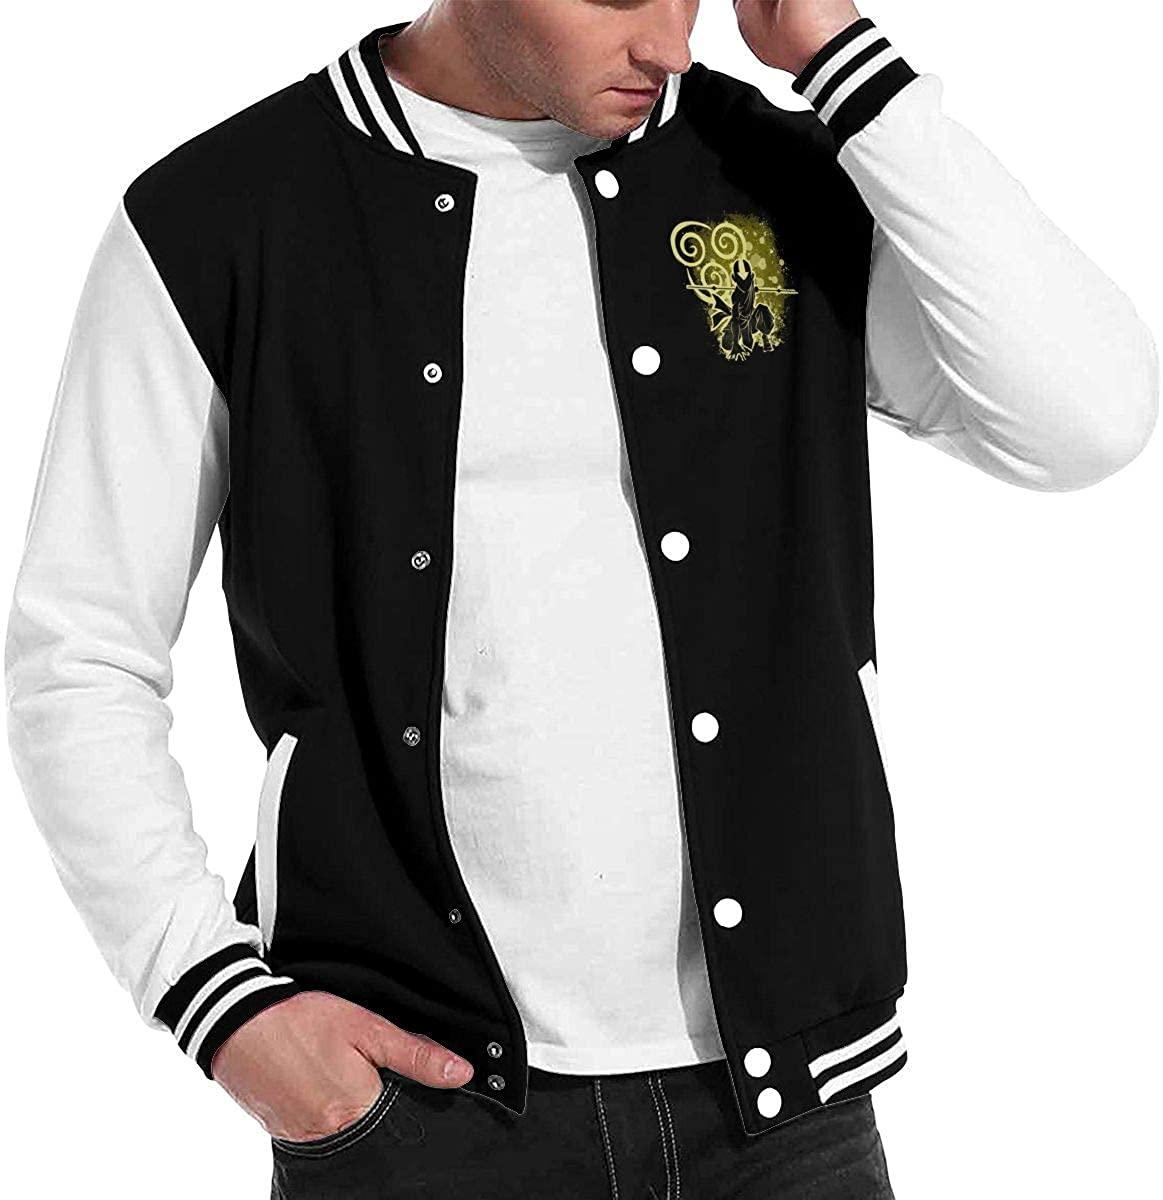 Avatar The Last Airbender Unisex Hipster Baseball Uniform Jacket Sport Coat Black Black